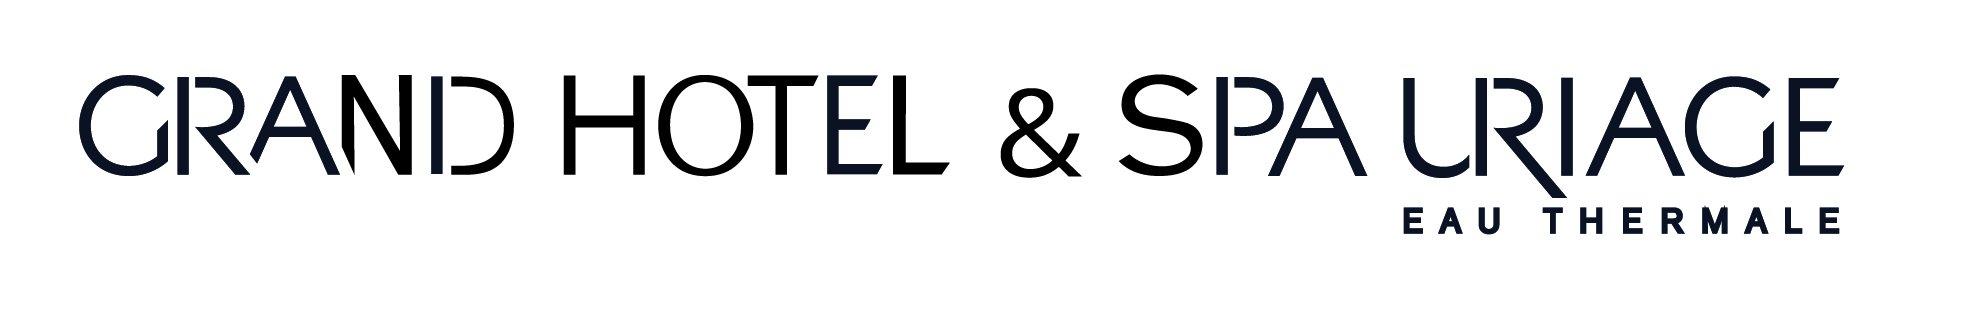 logotype2017-01.jpg